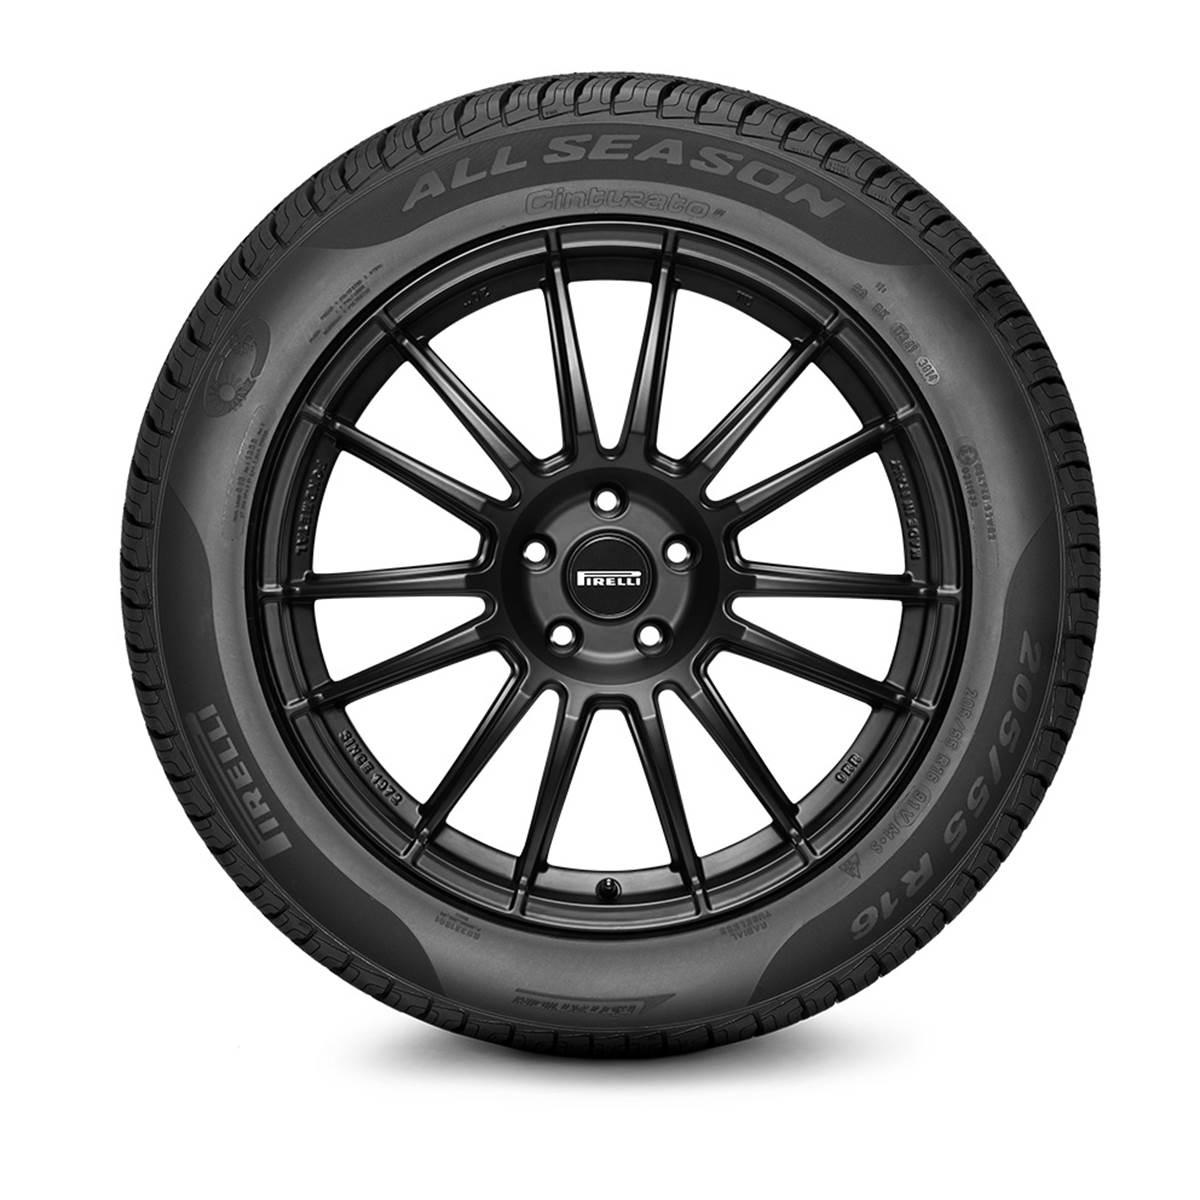 Pneu 4 Saisons Pirelli 195/65R15 91H Cinturato All Season